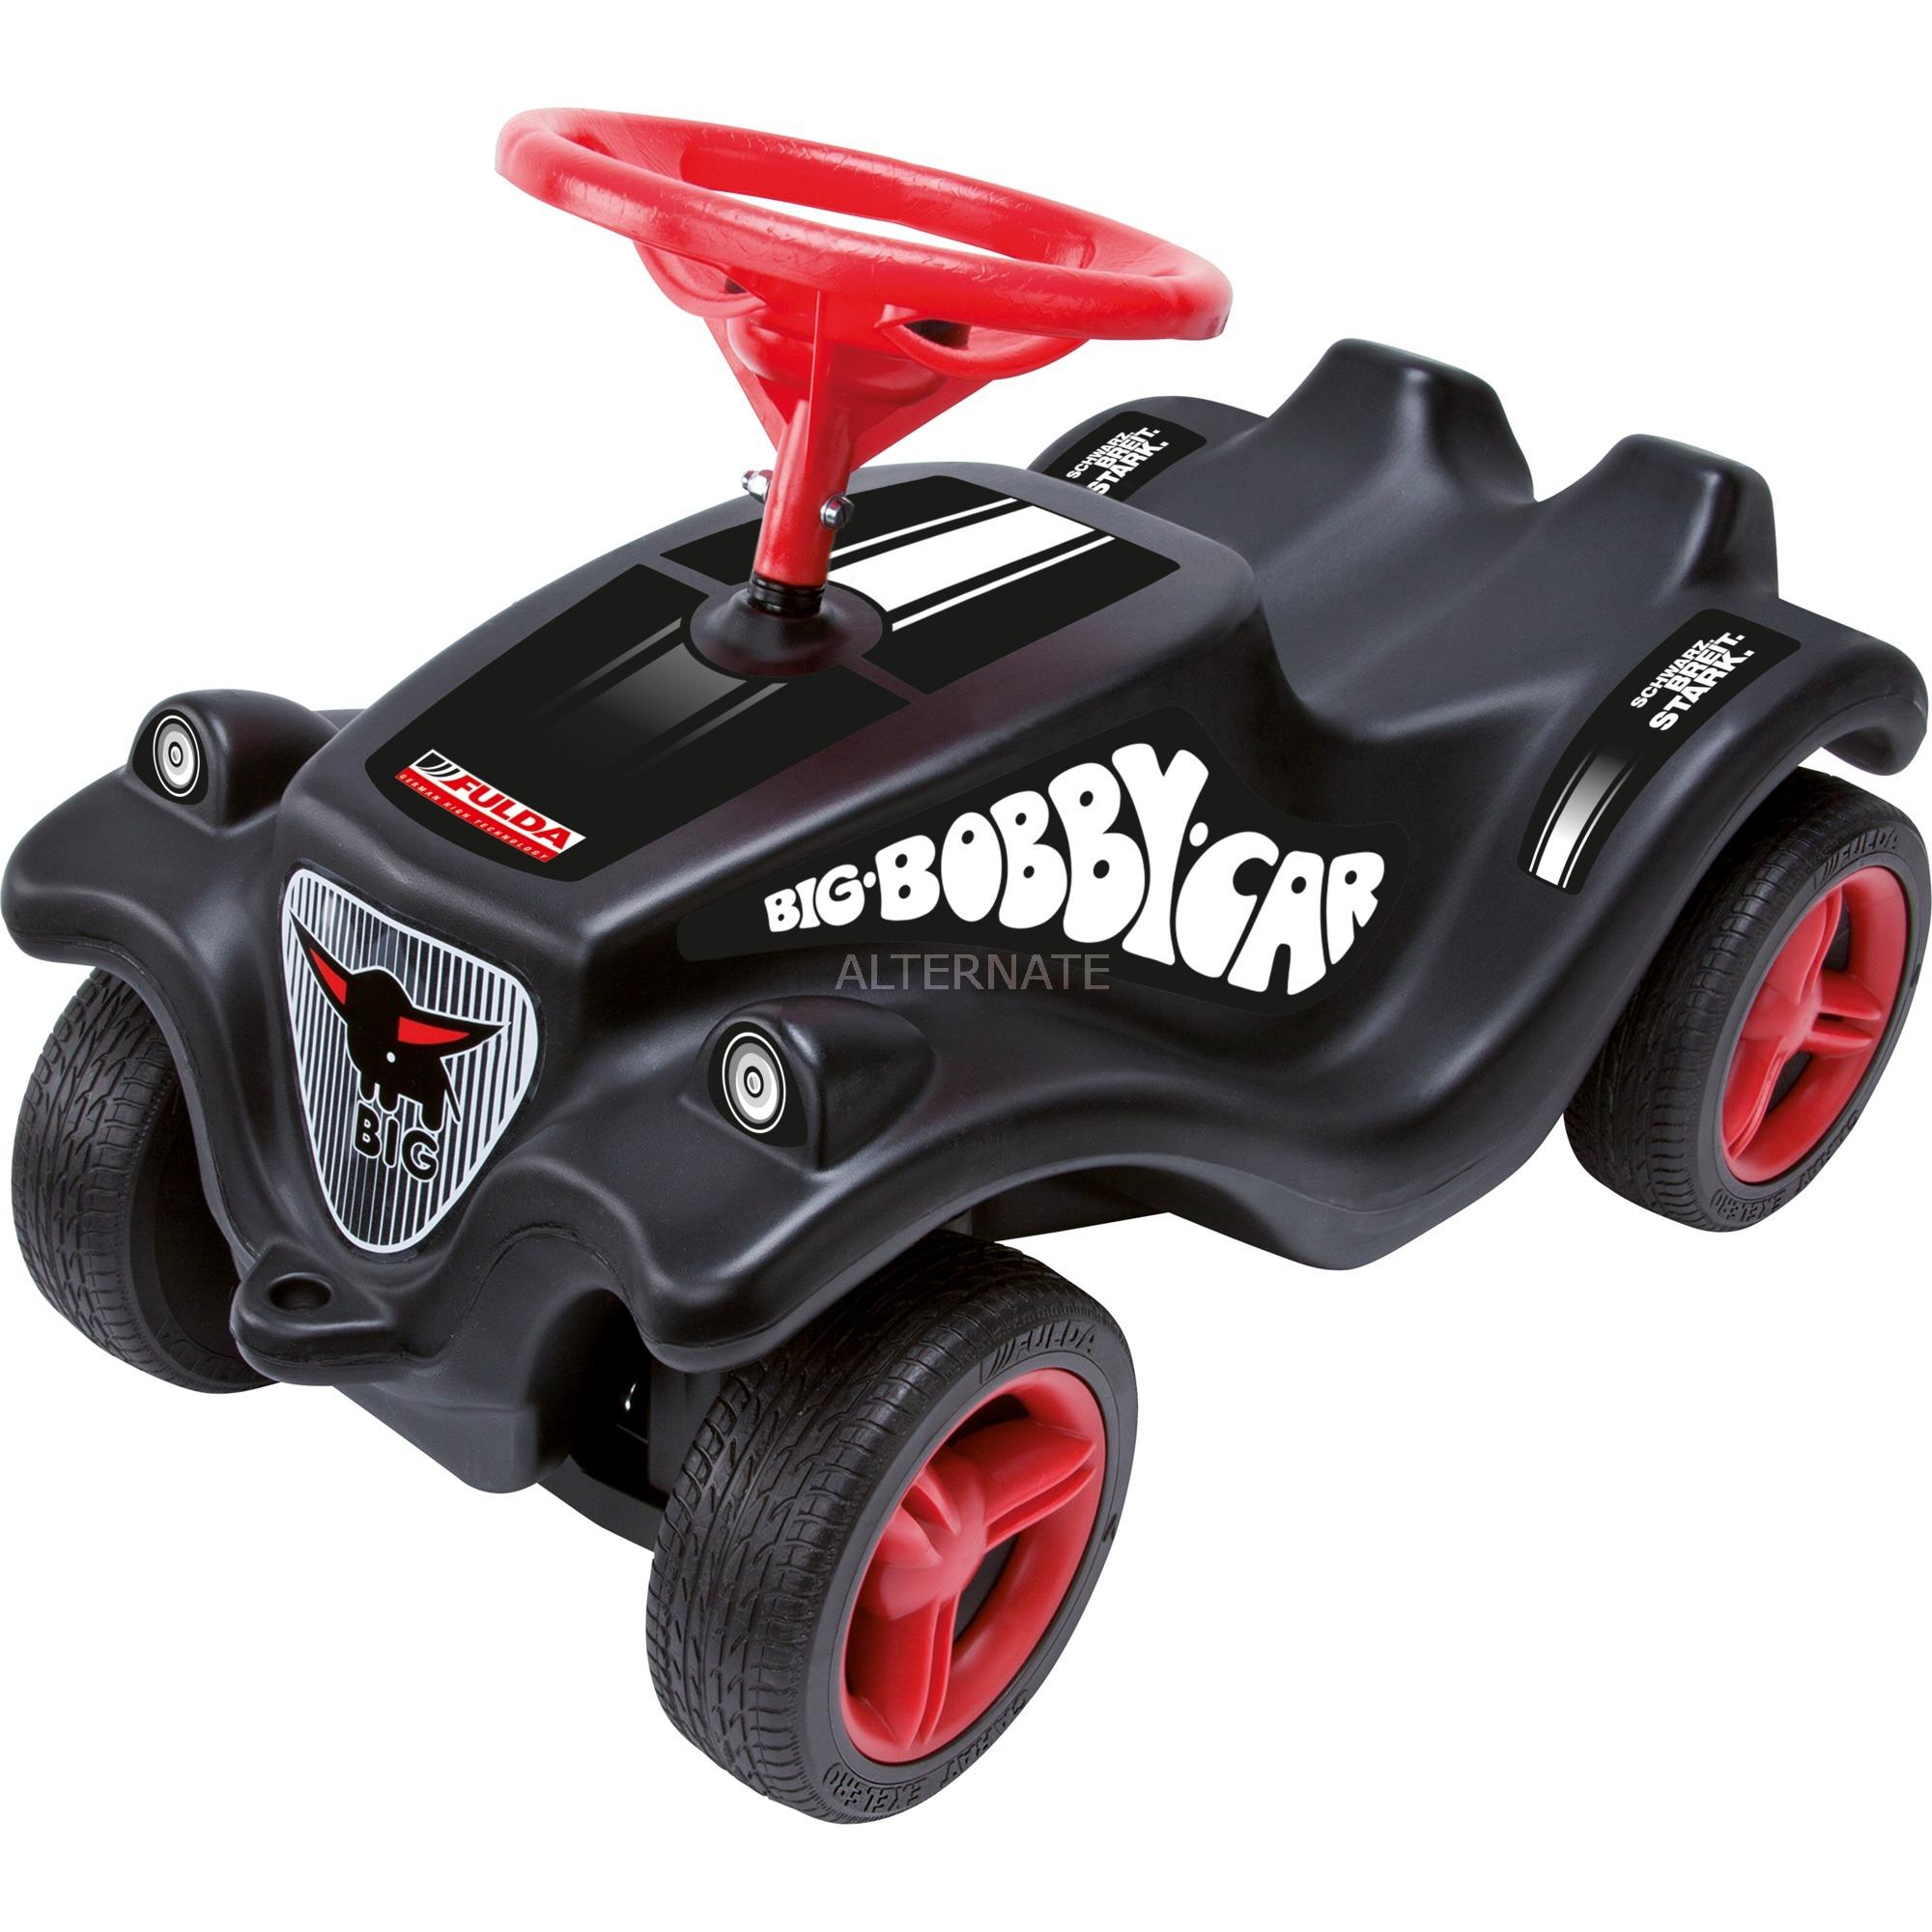 800056102 no categorizado, Automóvil de juguete